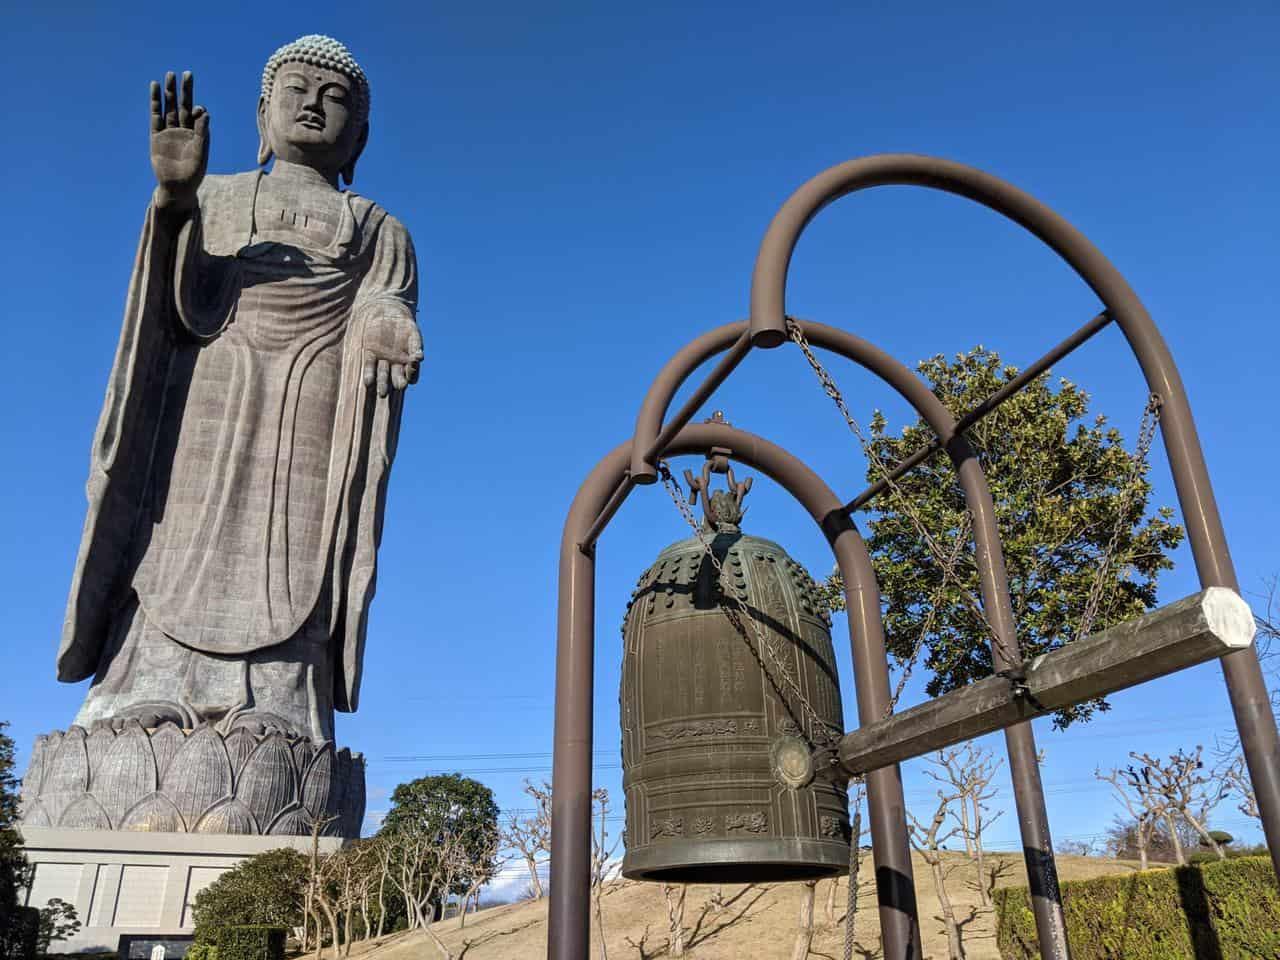 Pilgrimage to Ibaraki's Giant Buddha: Ushiku Daibutsu